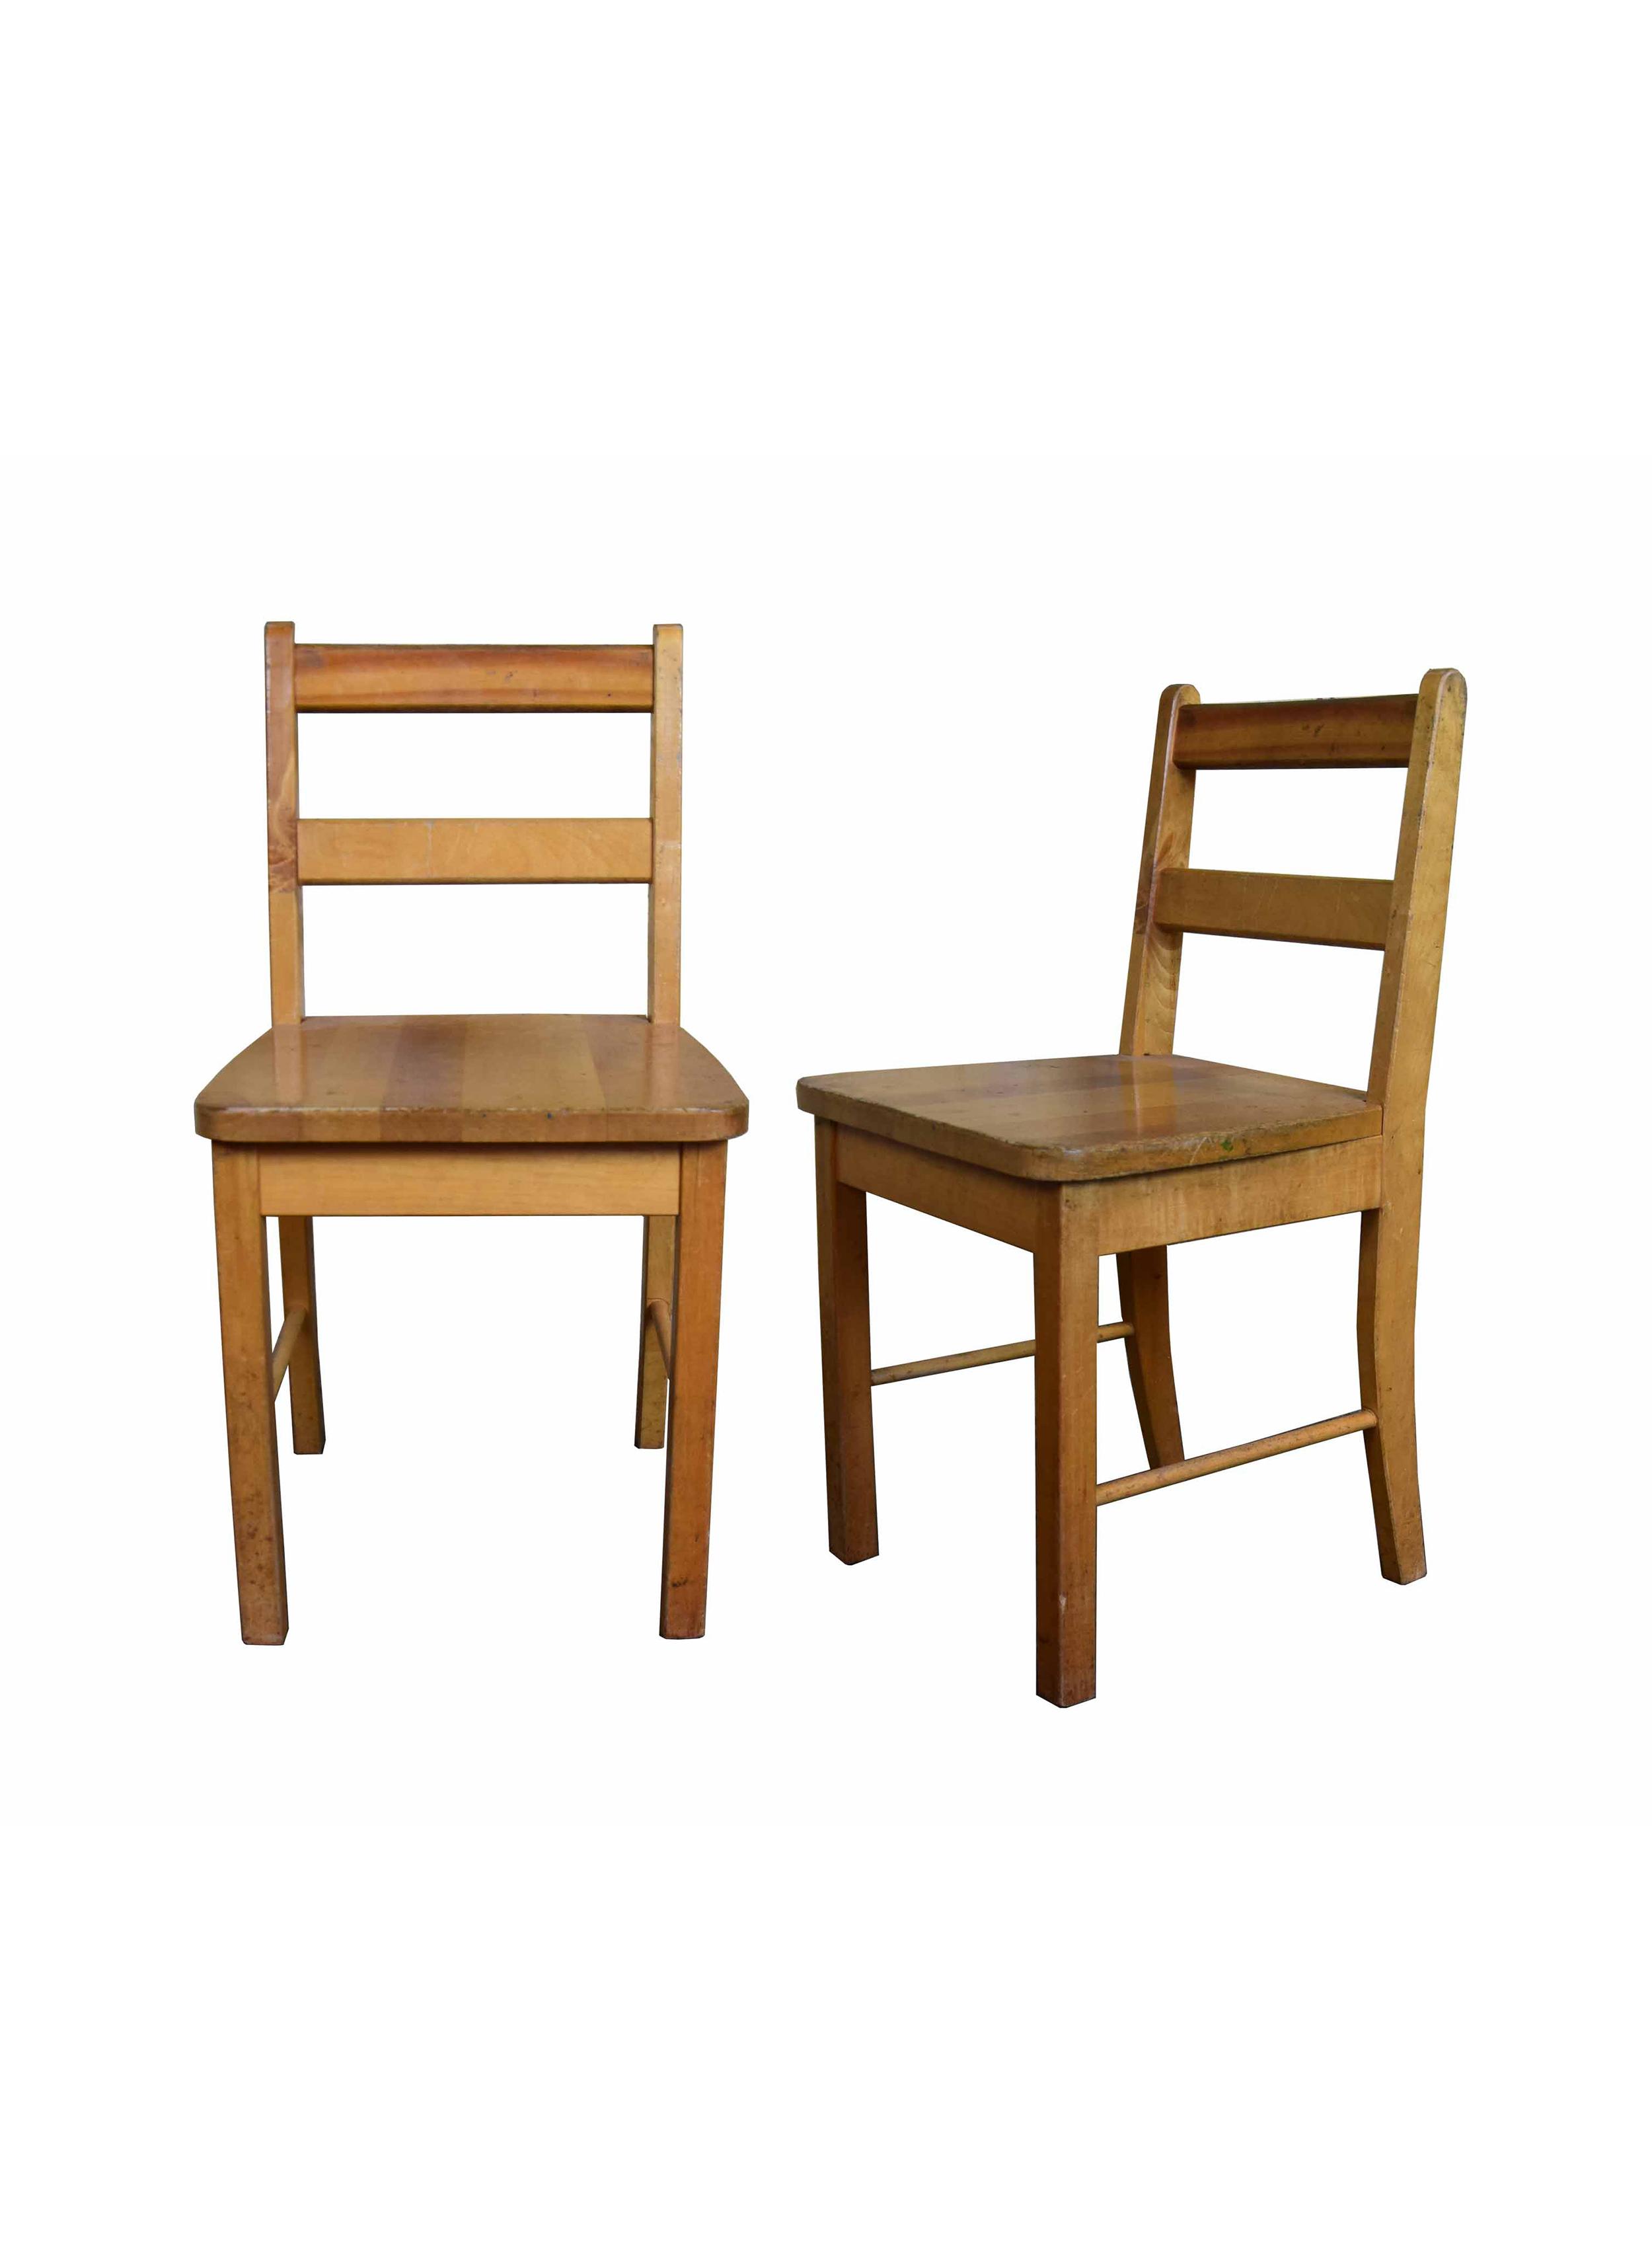 46832-maple-kids-chairs-full.jpg